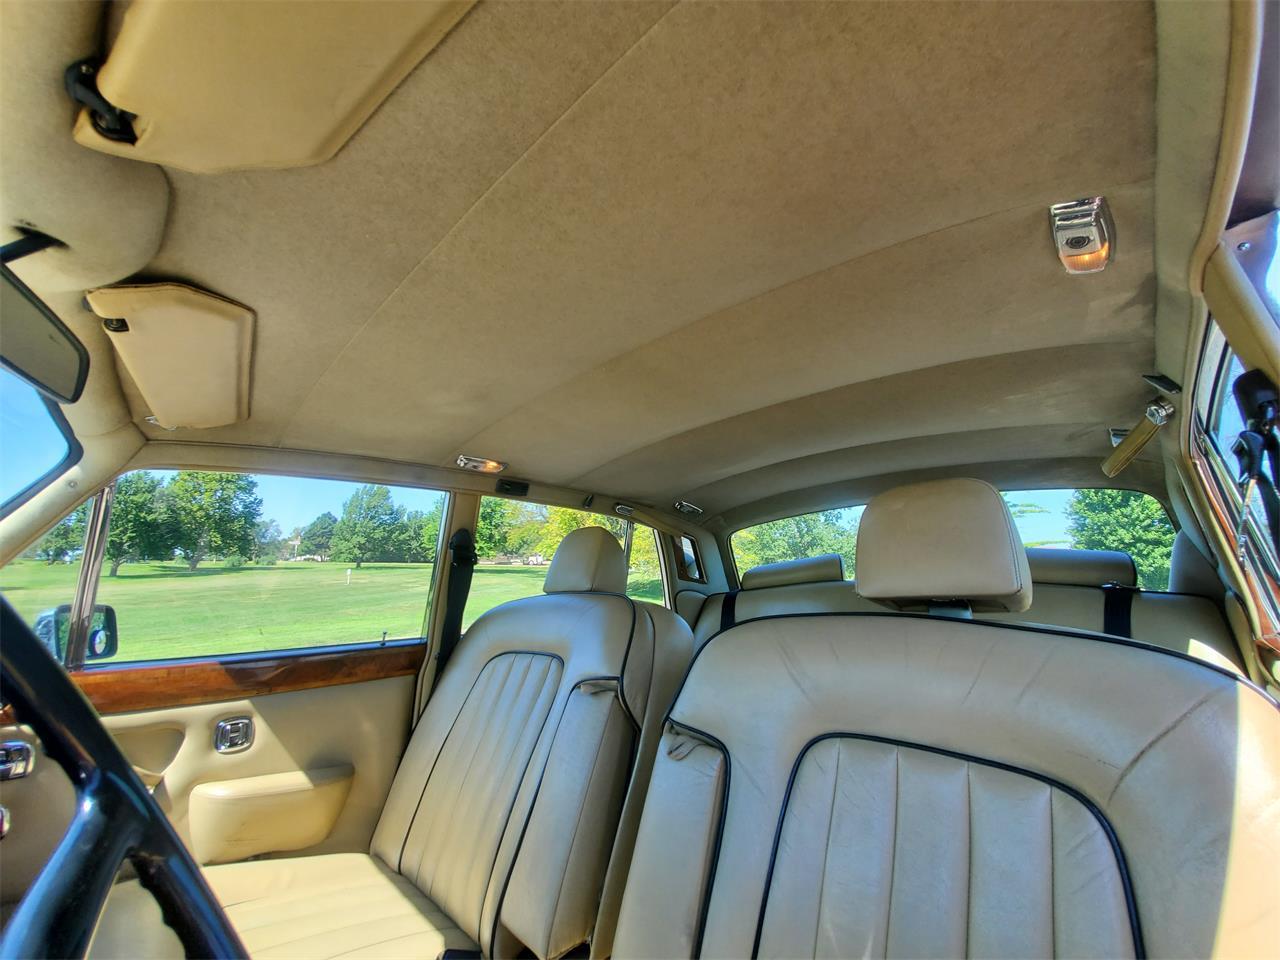 1980 Rolls-Royce Silver Shadow II (CC-1258427) for sale in Clay Center, Kansas